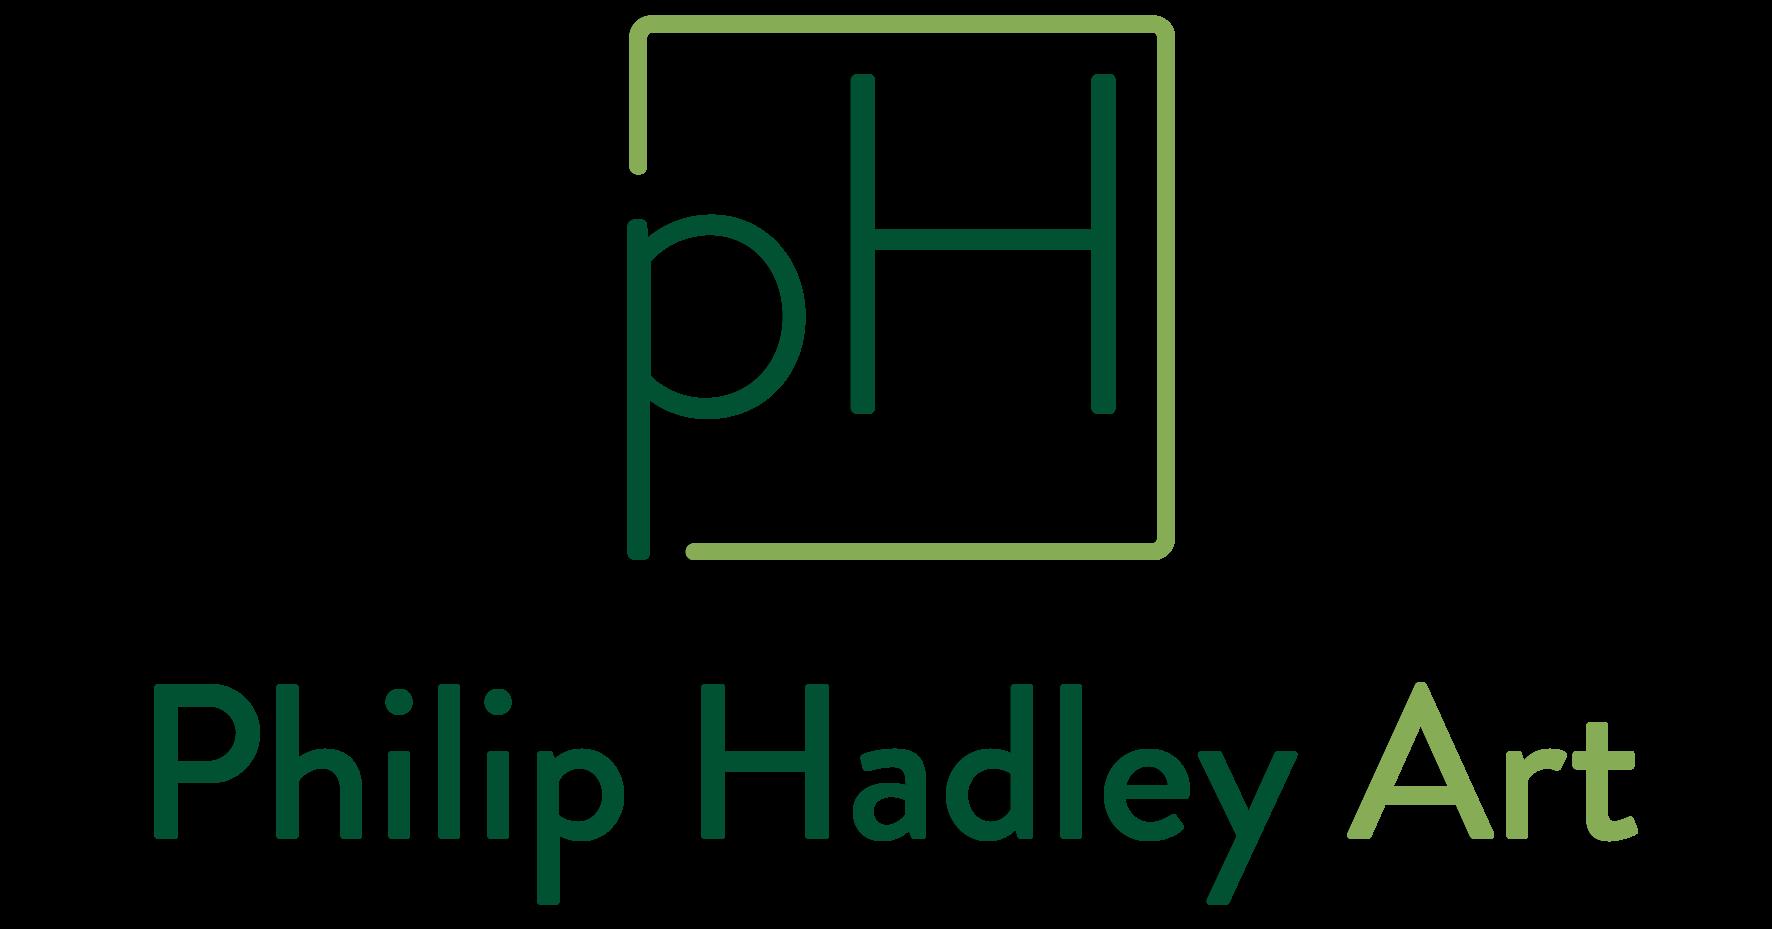 Philip Hadley Art